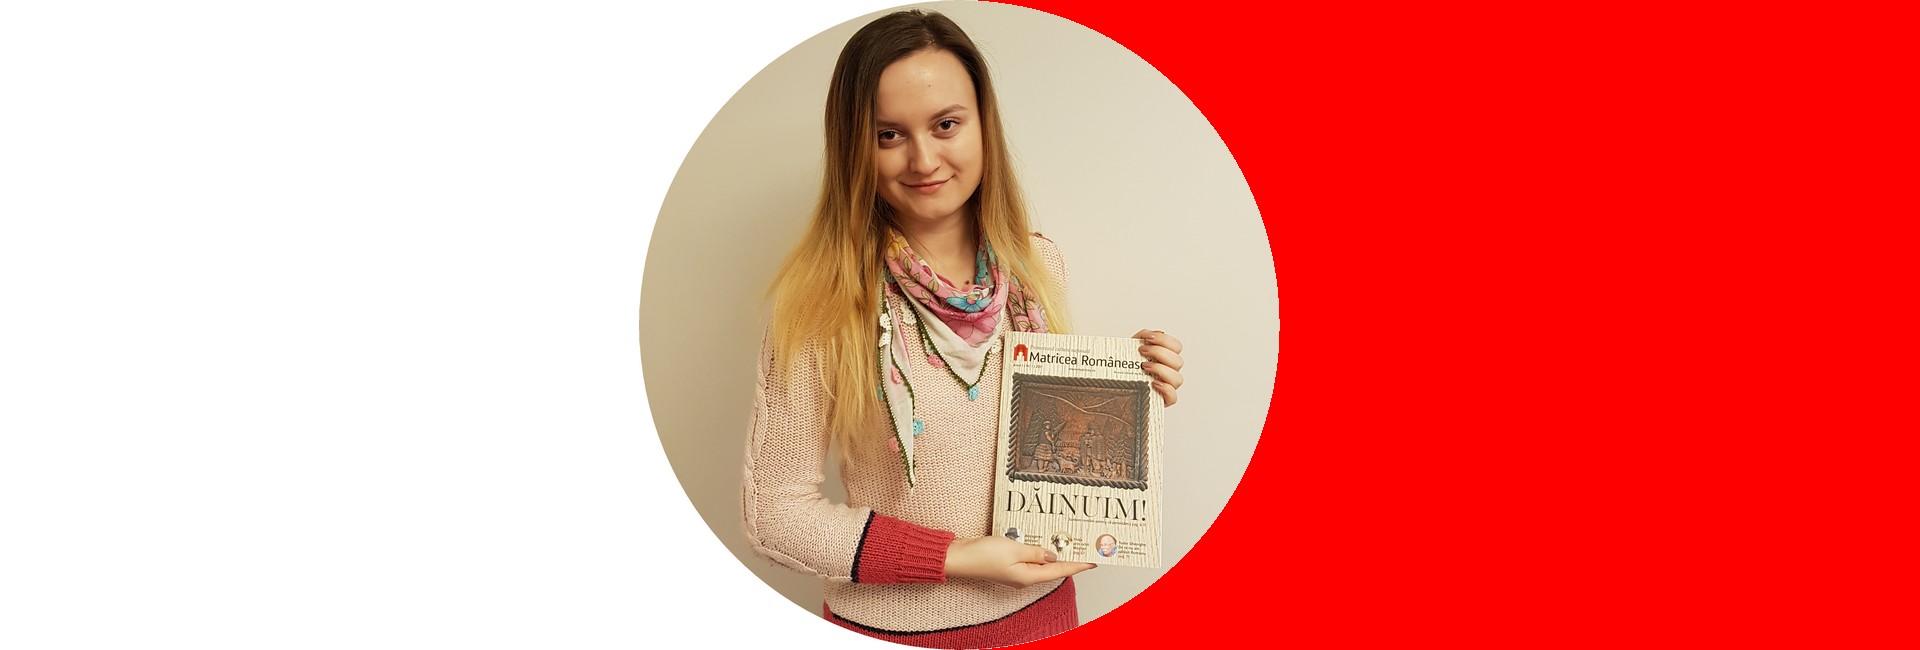 un mărţişor român despre o basarabeancă români basarabeni Basarabia slider